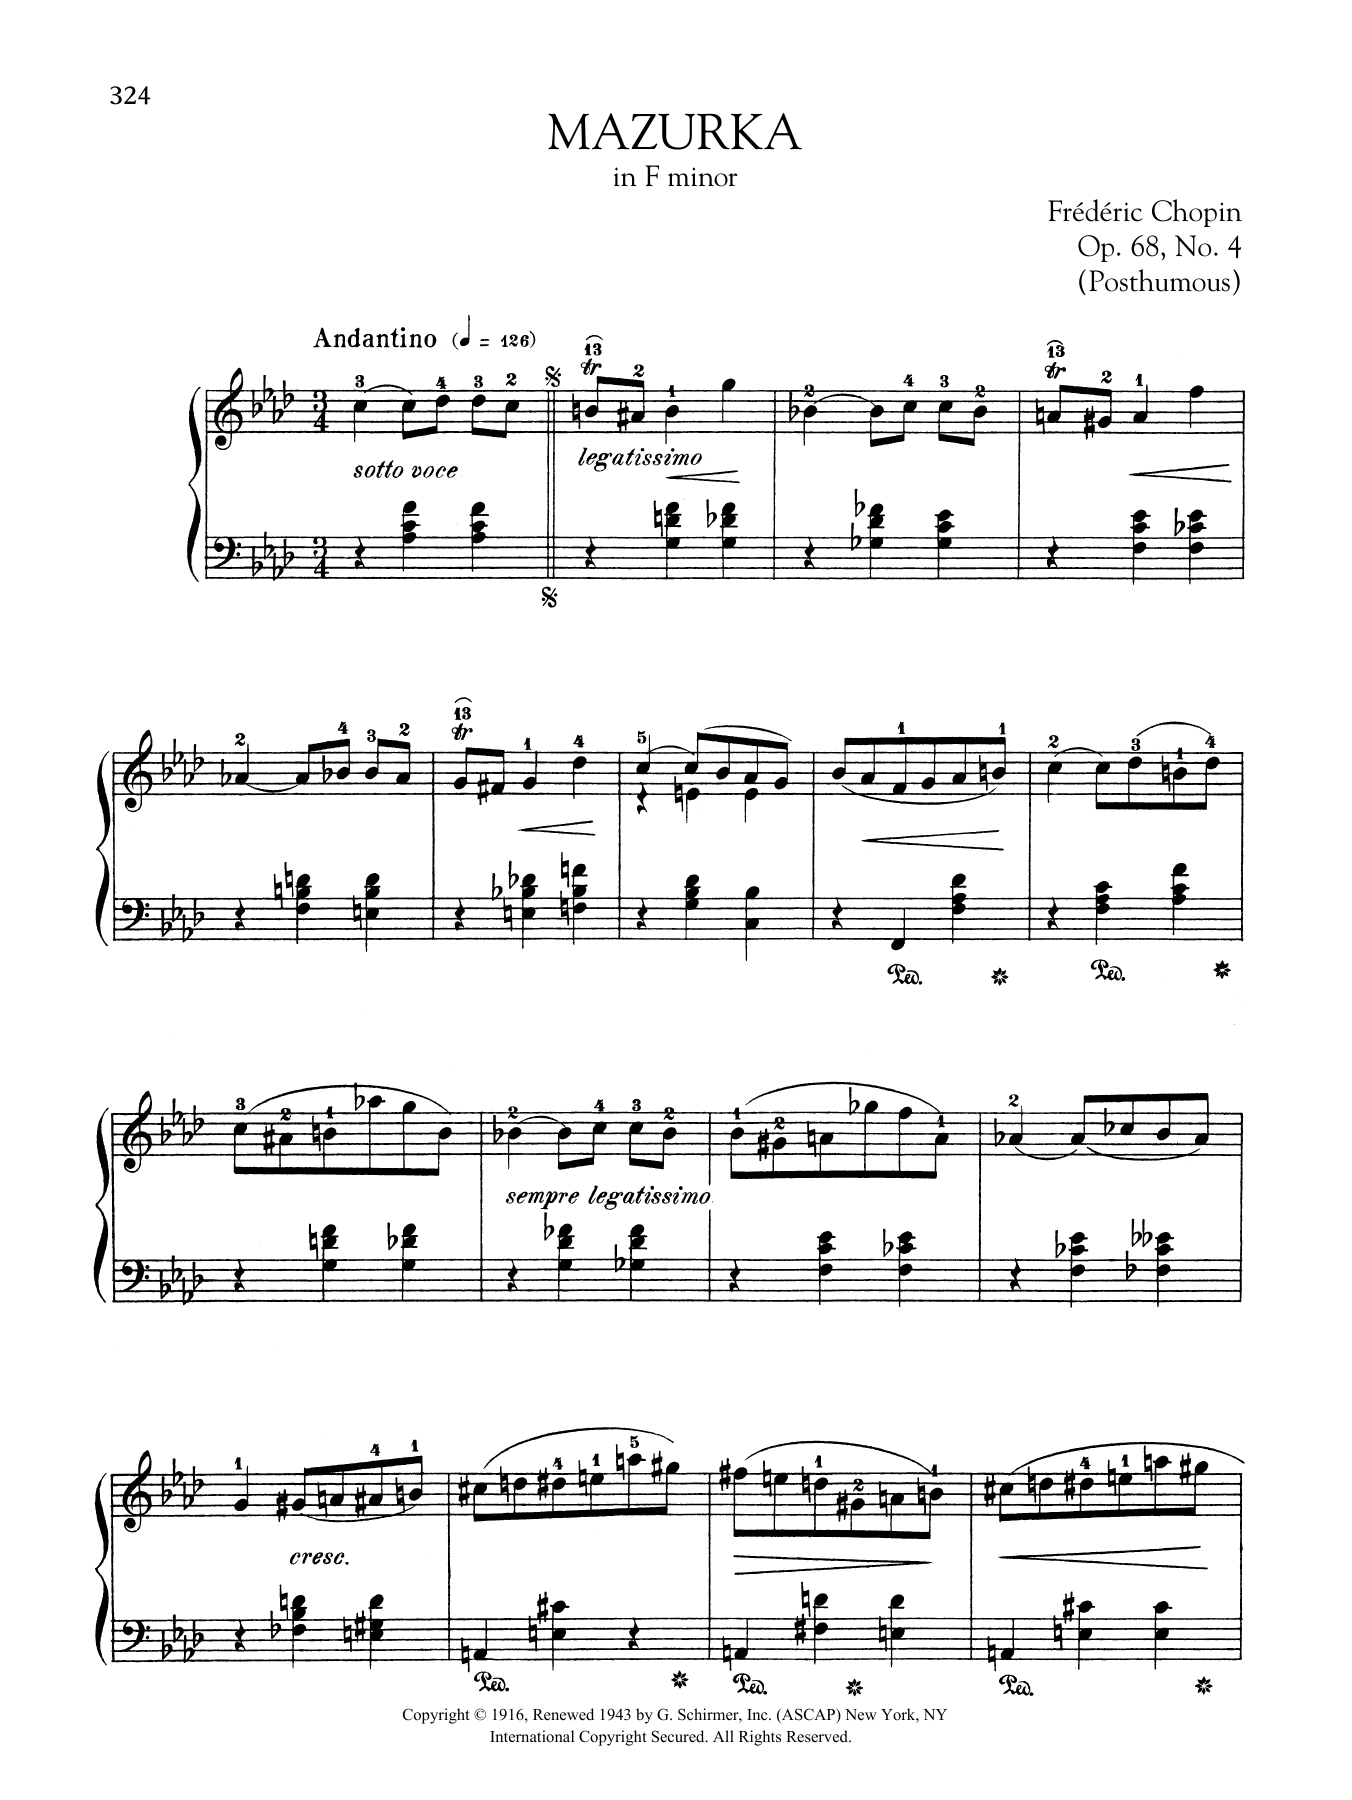 Mazurka in F minor, Op.68, No. 4 (Posthumous) Sheet Music